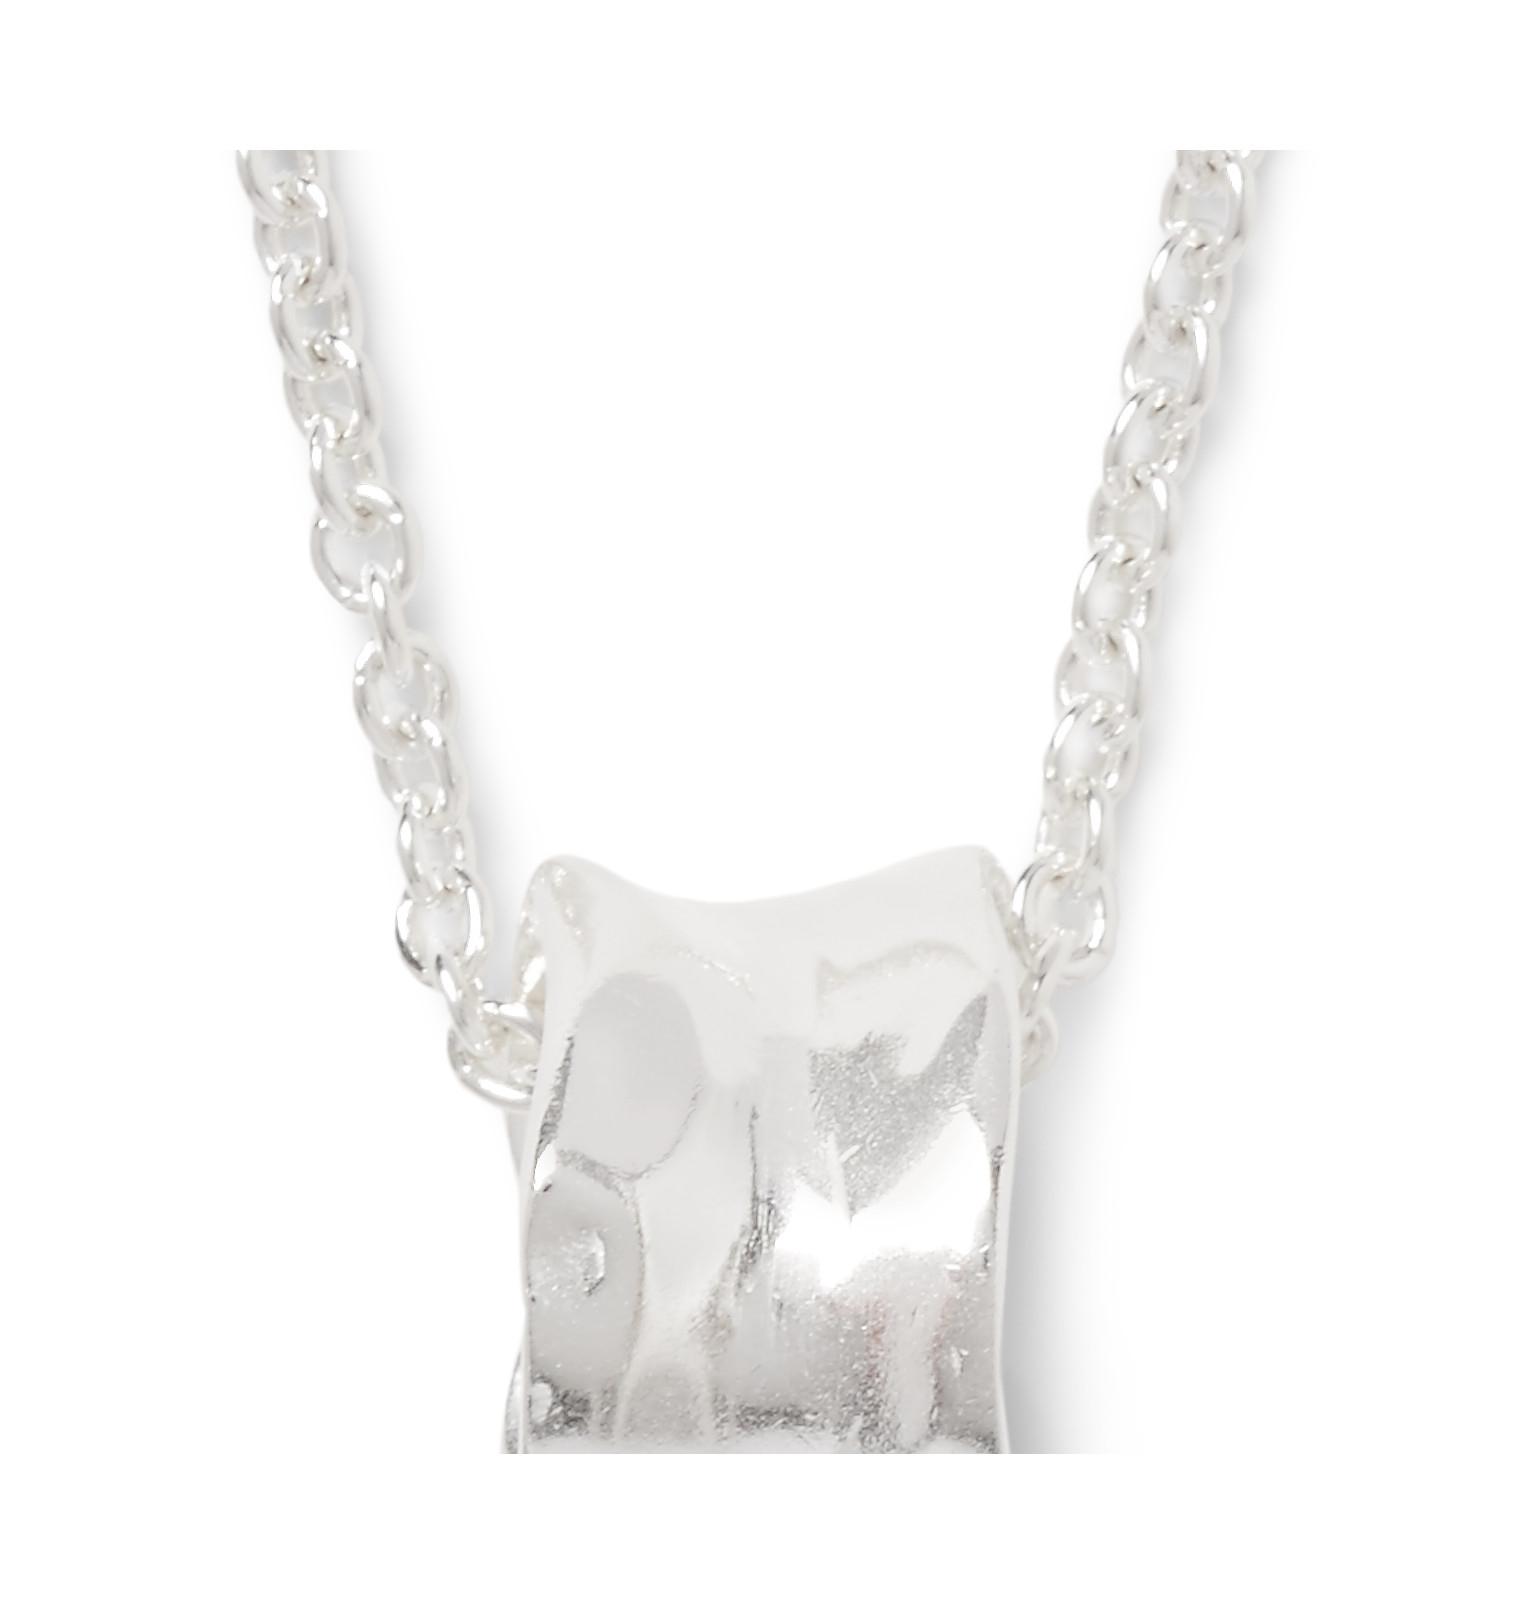 Maison Margiela Silver Necklace in Metallic for Men